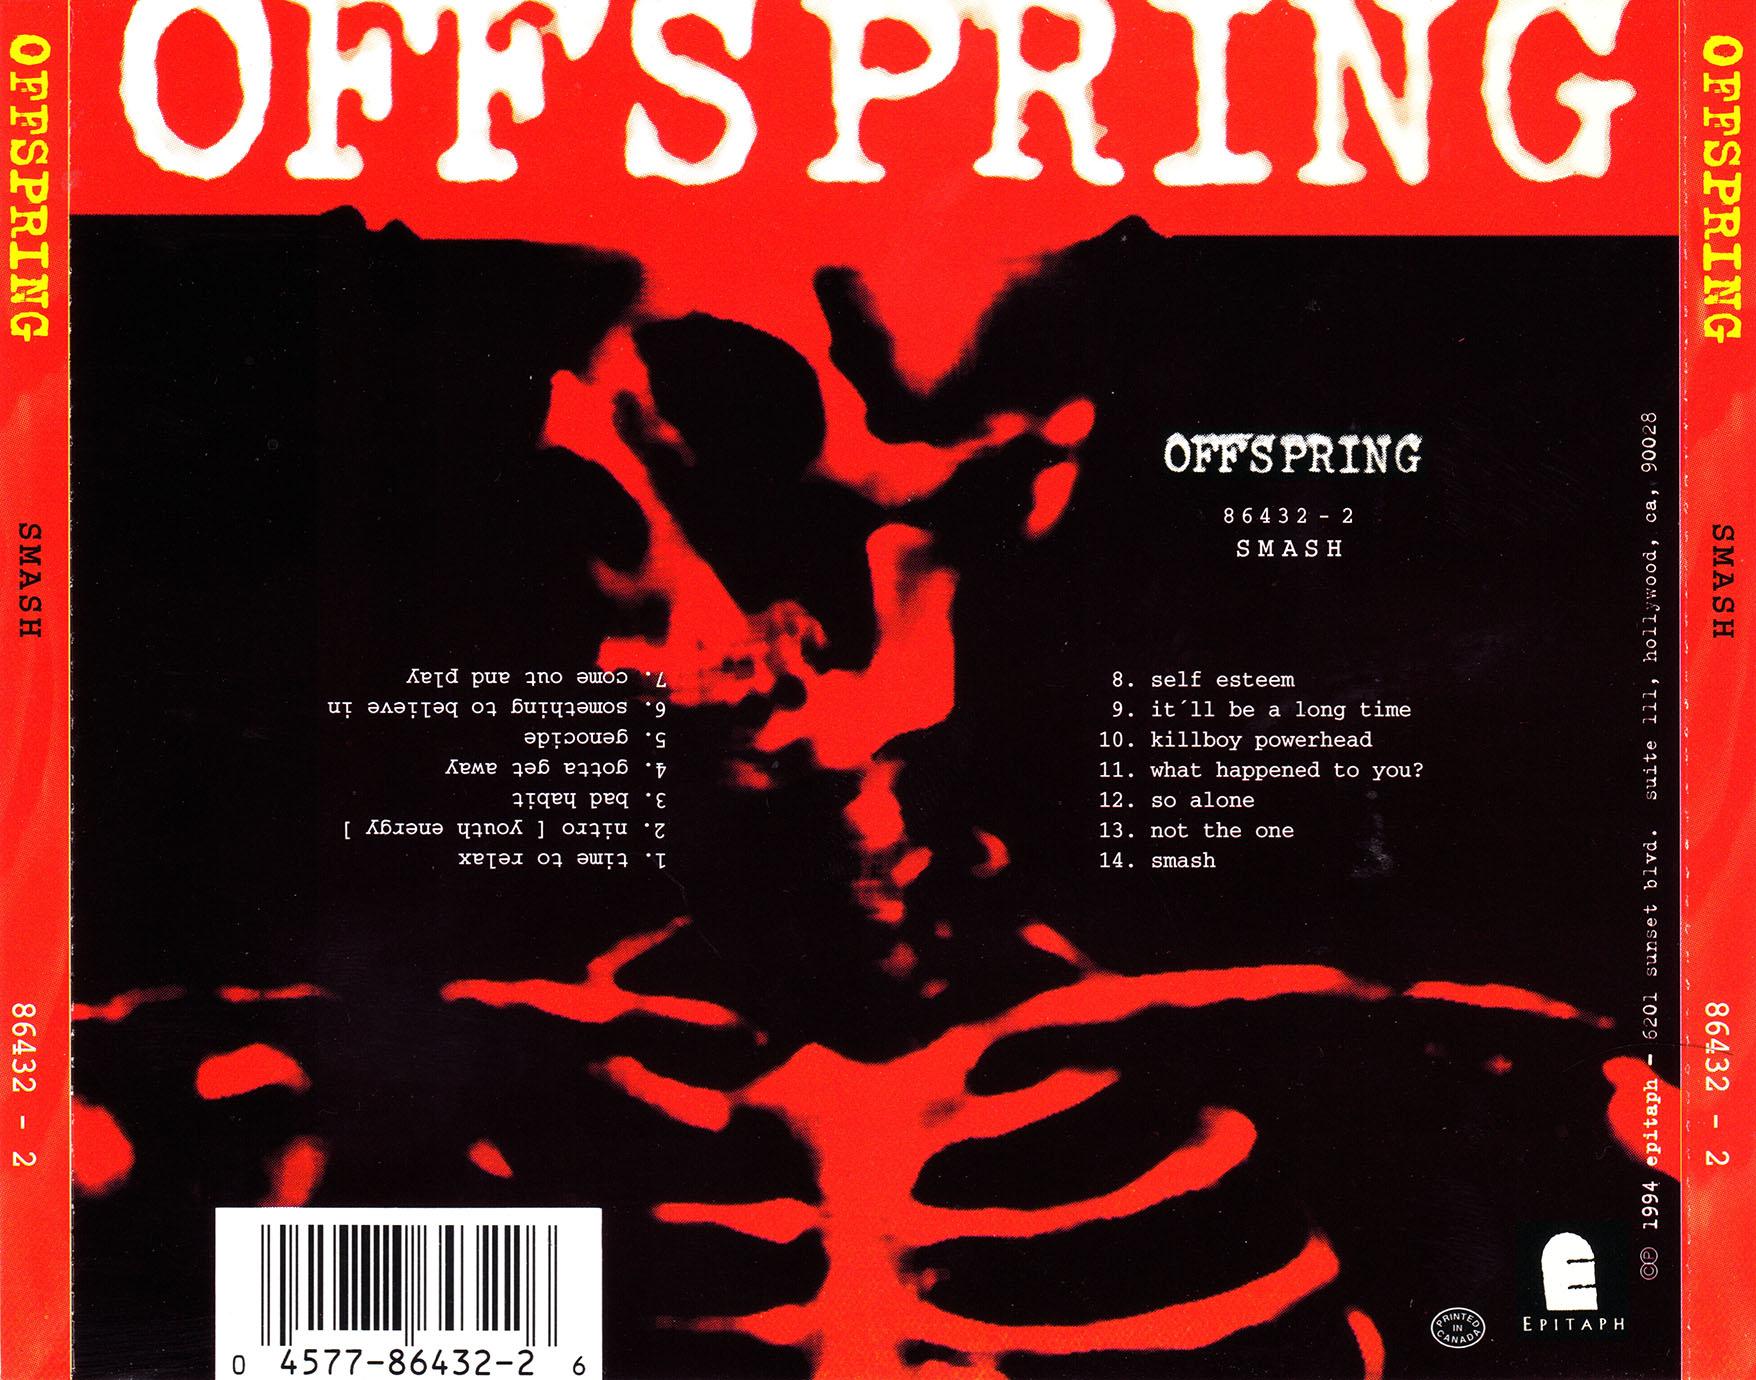 The Offspring - Smash (1994)